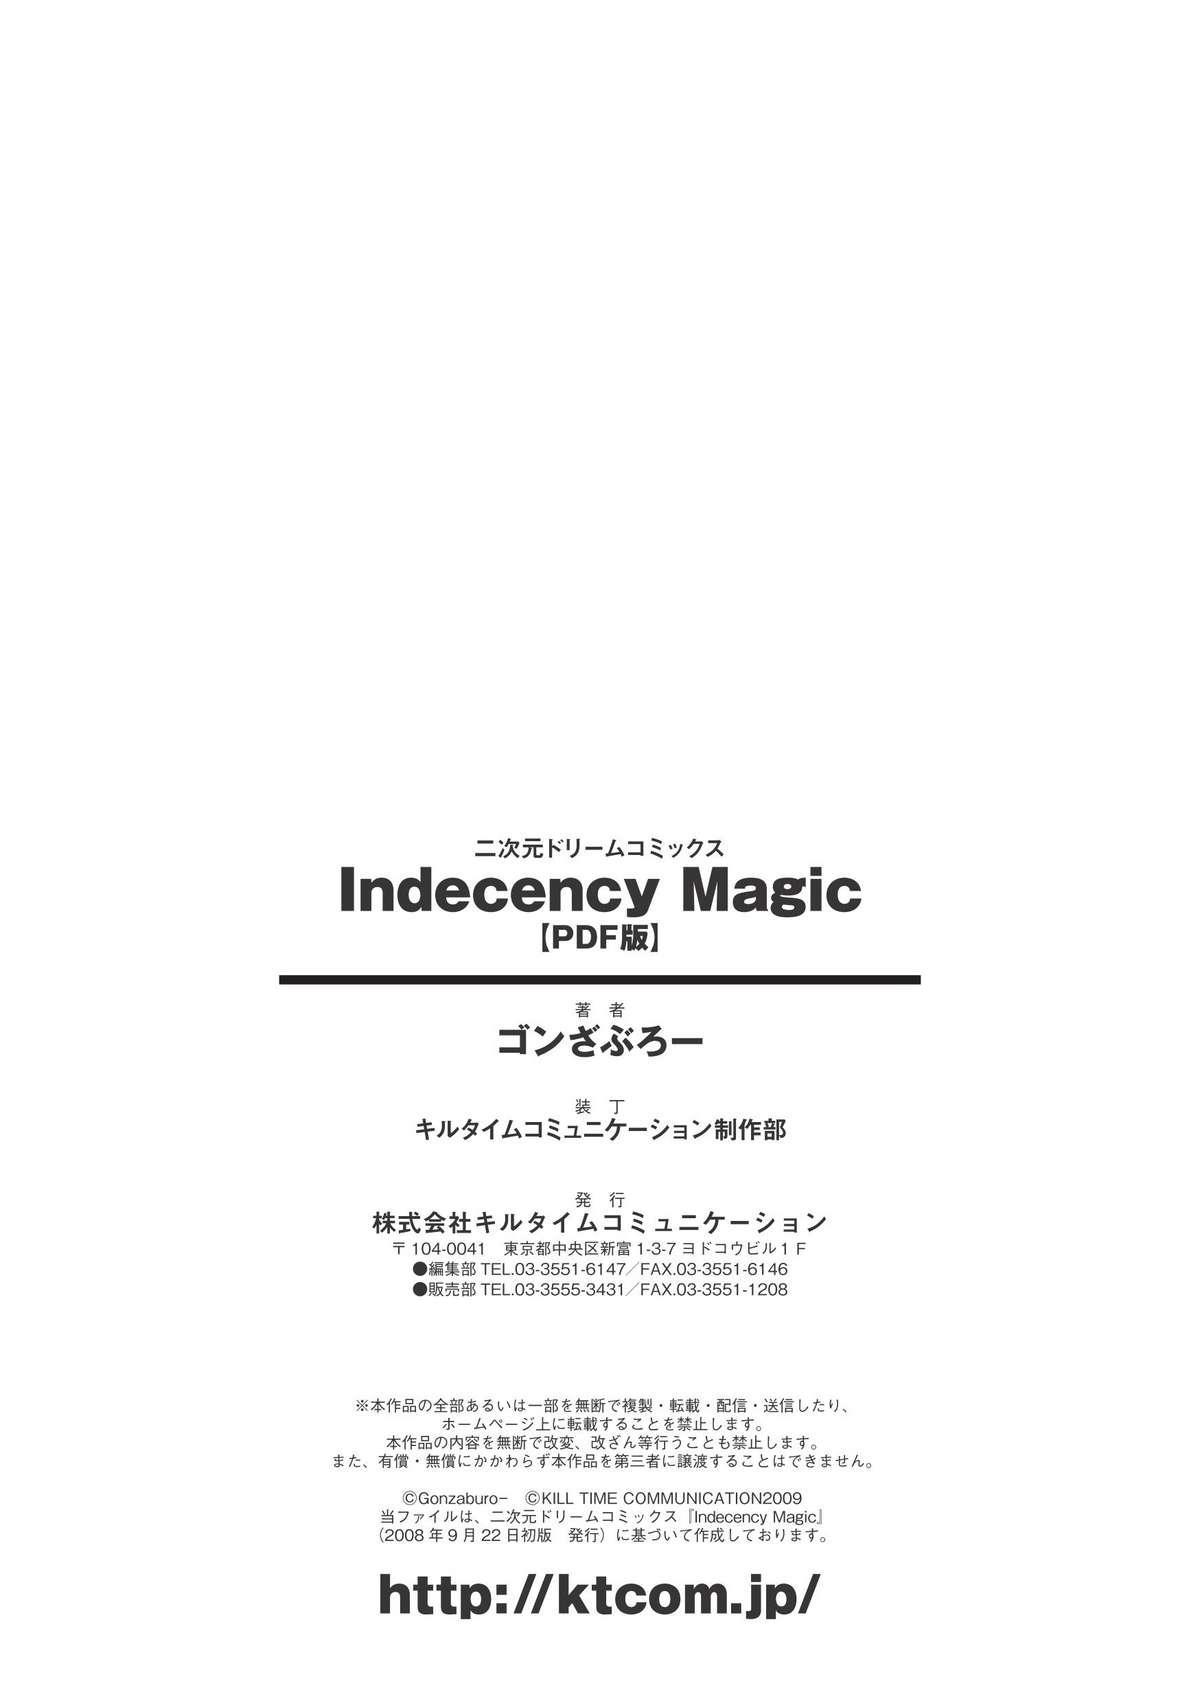 Indecency Magic 156